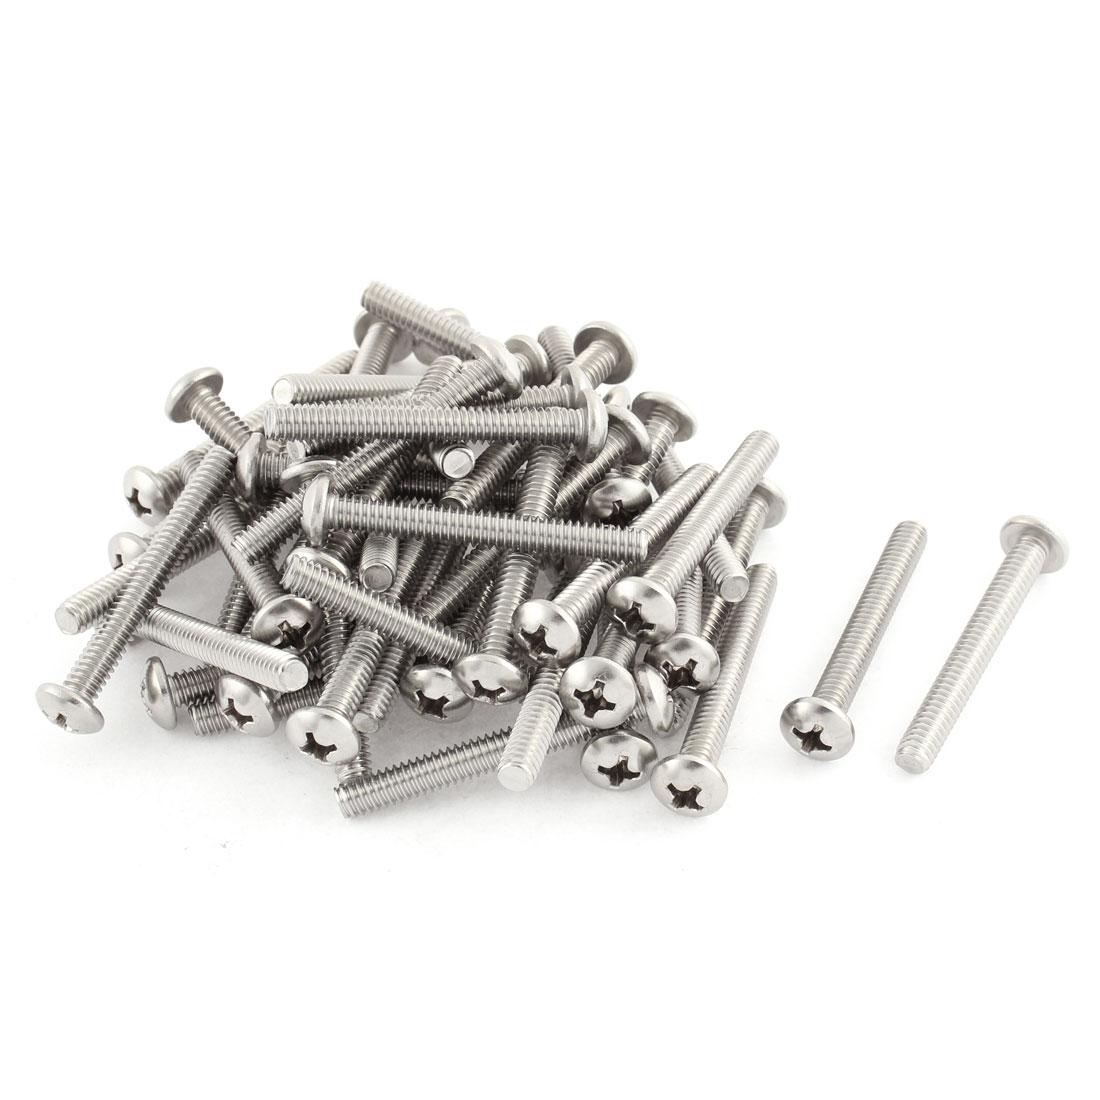 "55mm Long 1/4""x20x2"" Stainless Steel Phillips Cross Head Machine Screws Bolts 50 Pcs"